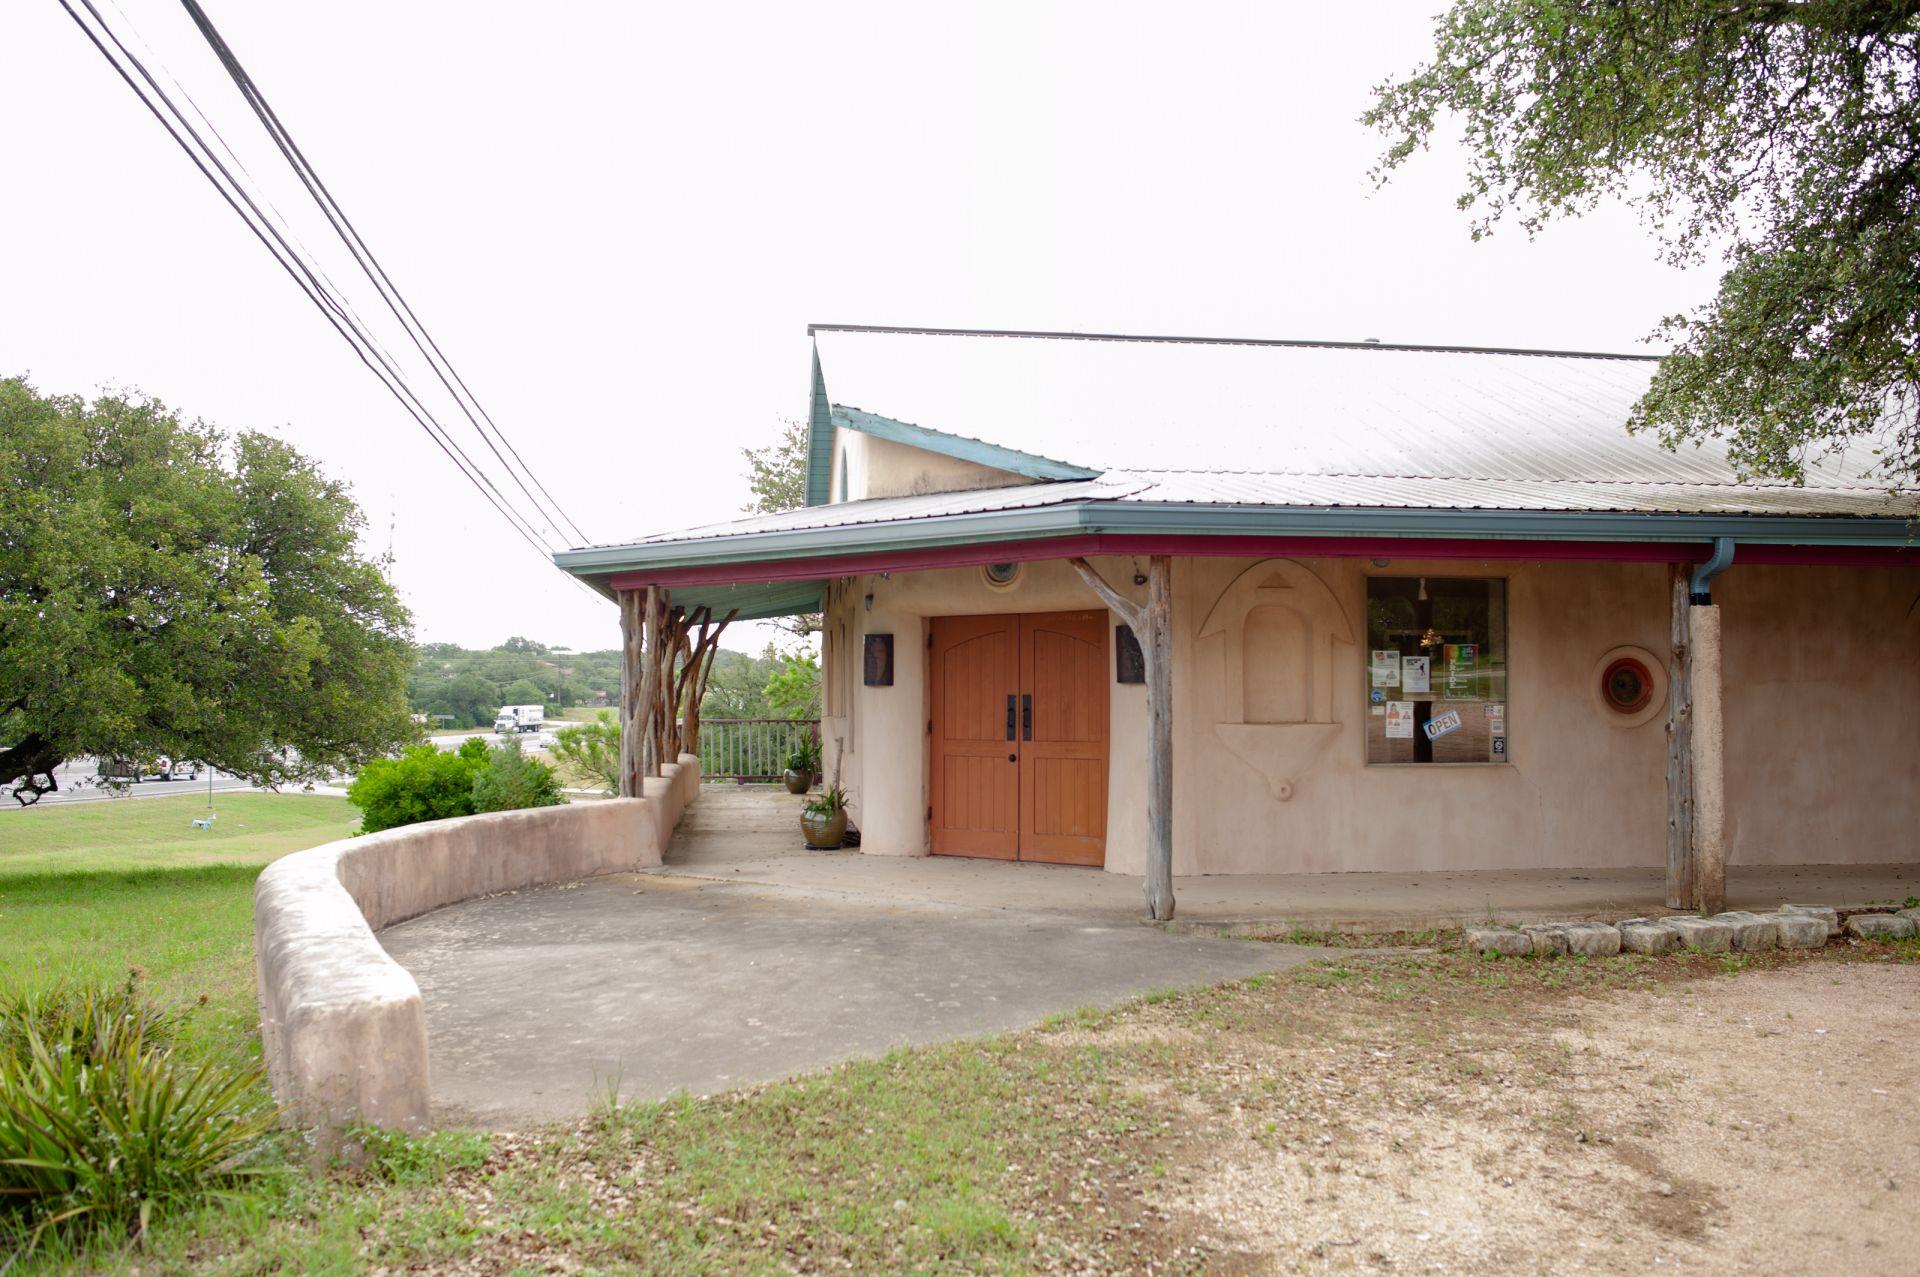 Sententia Vera Cultural Hub, Dripping Springs